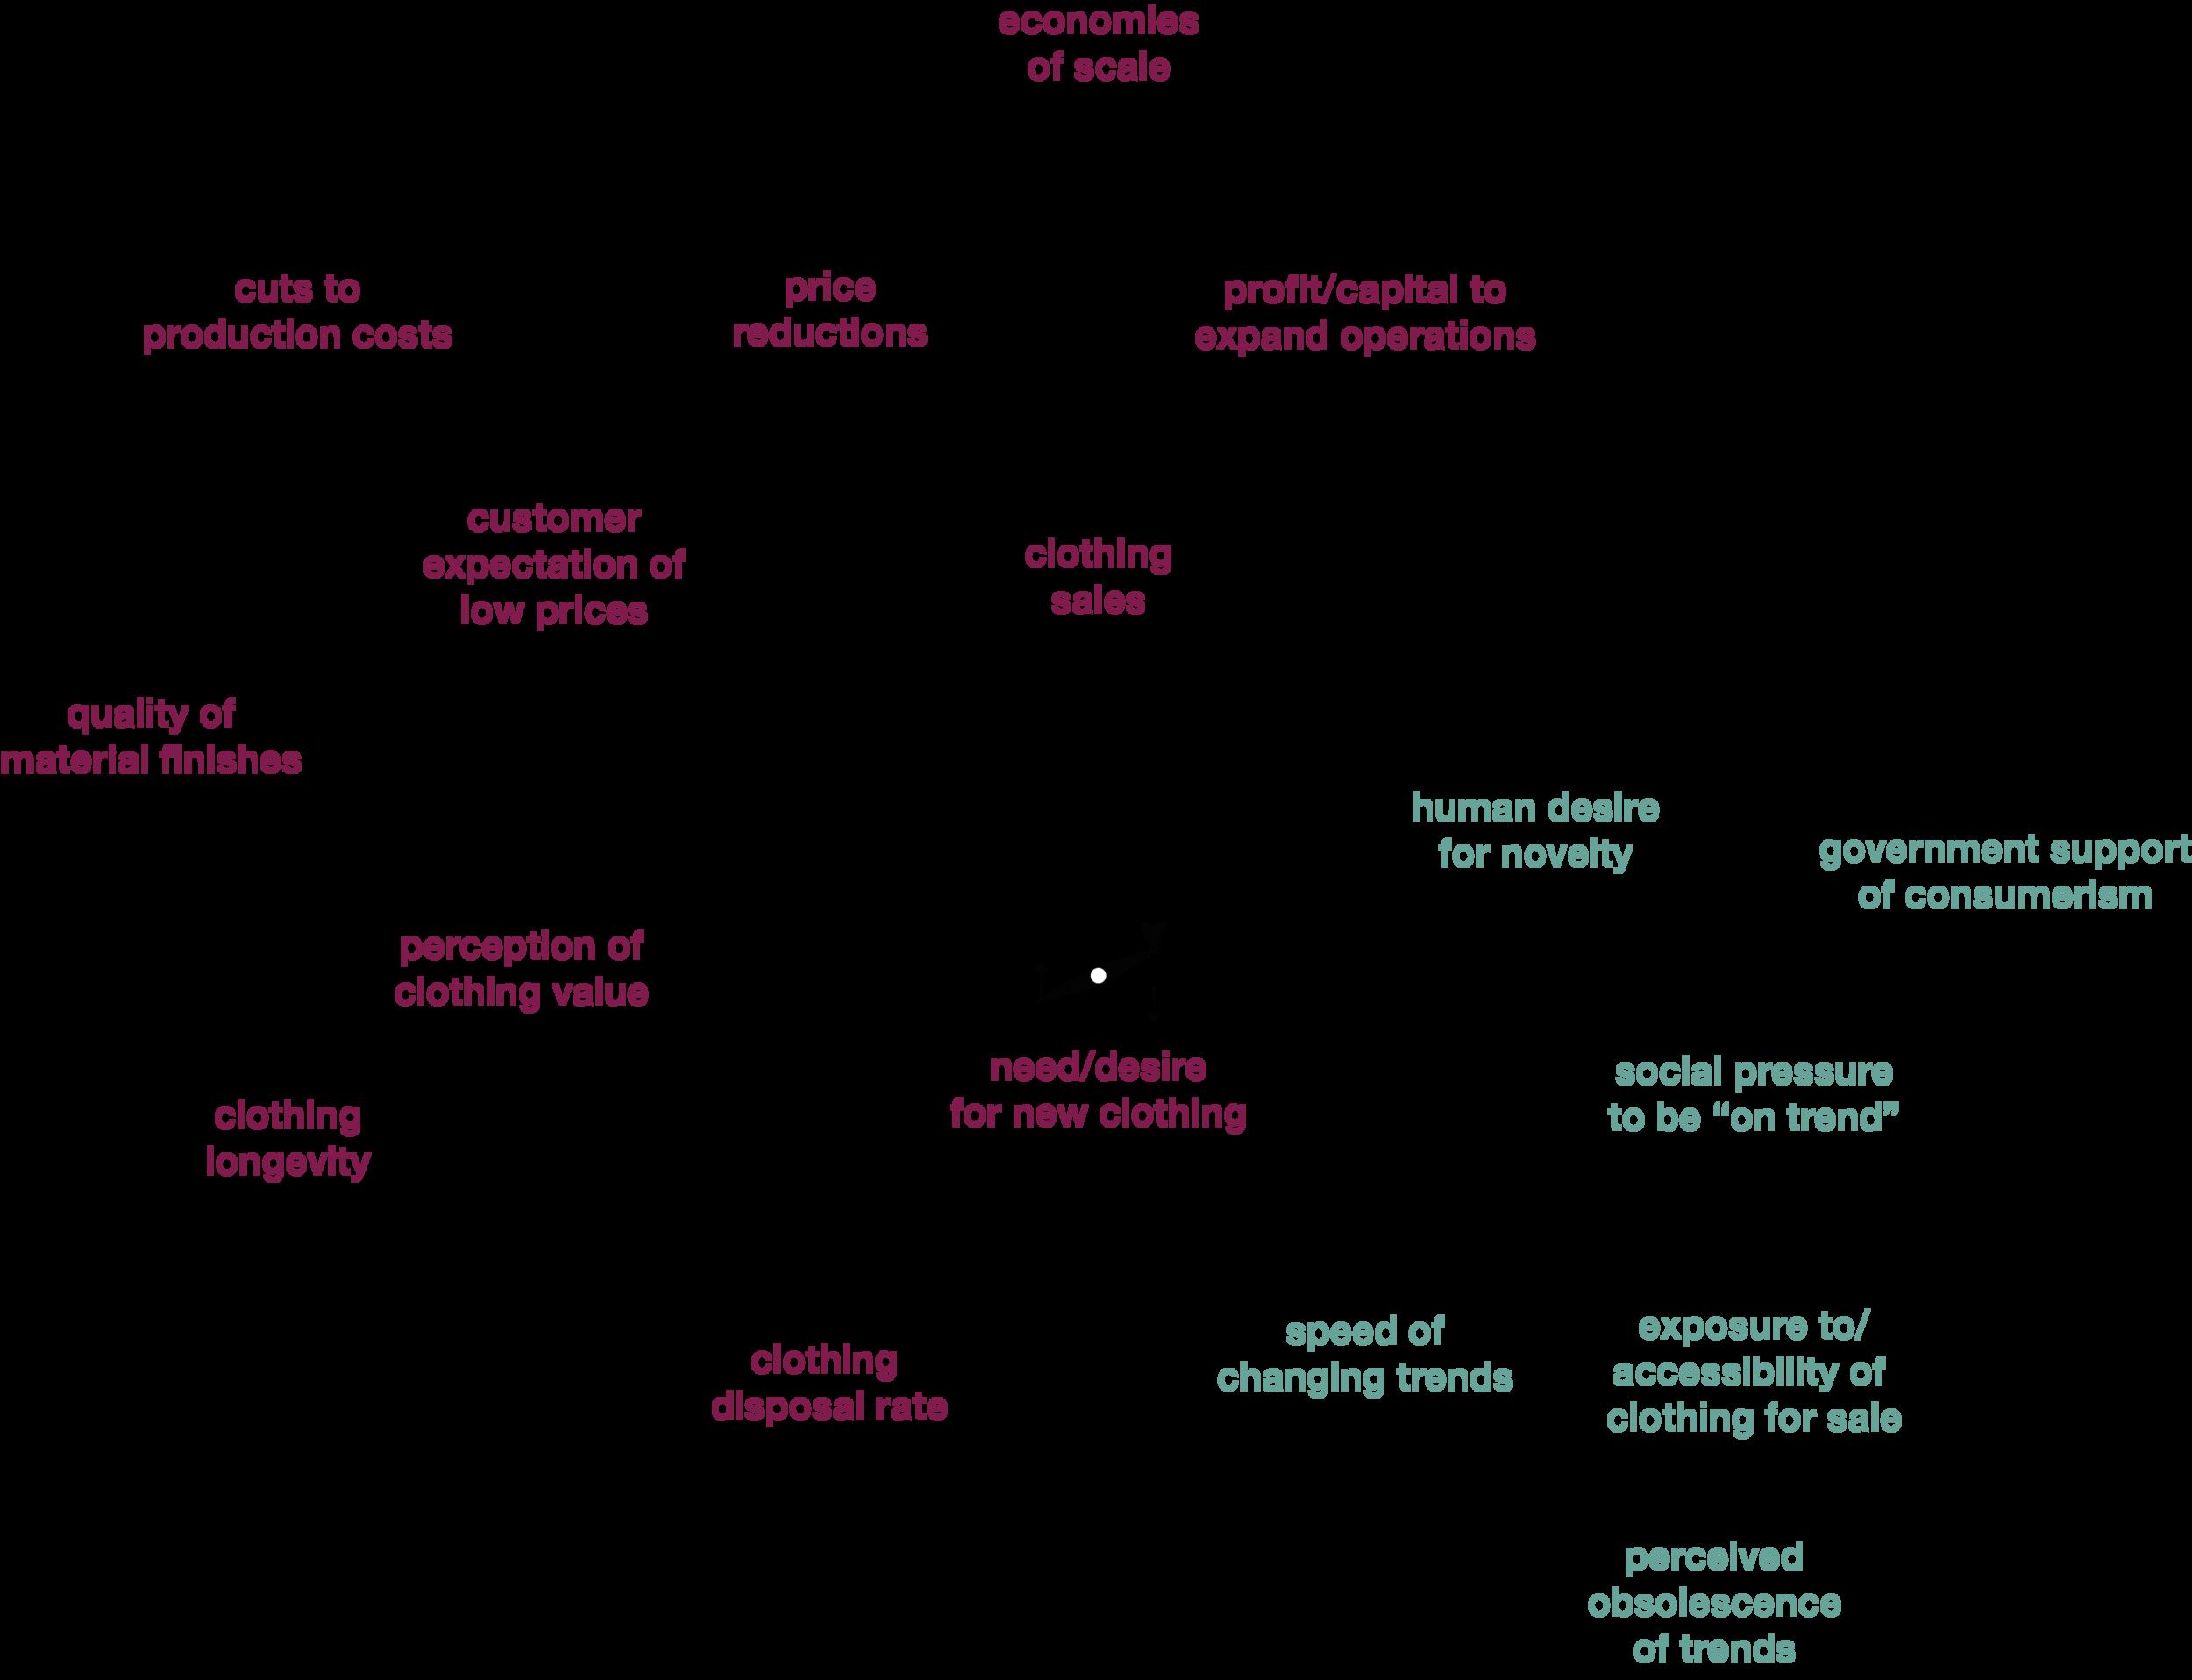 Escalation Archetype (Dempsey 2015)